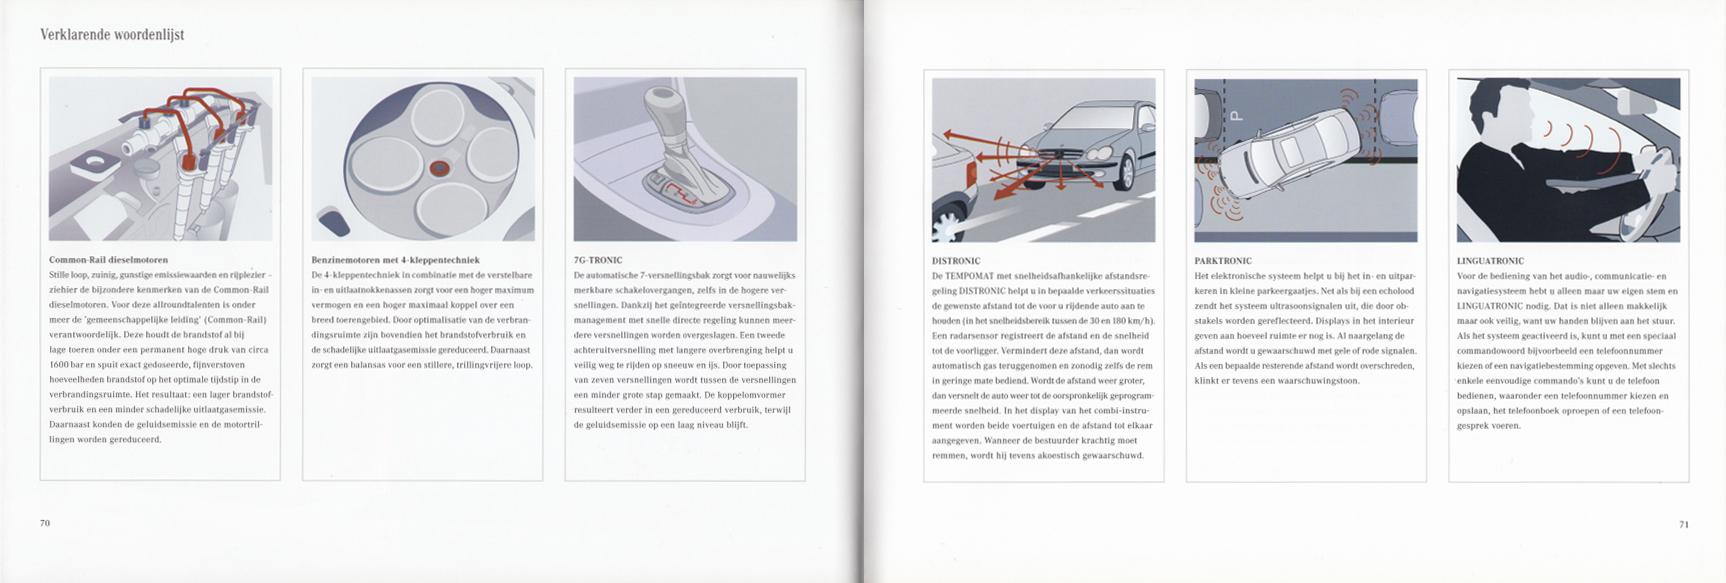 (A/C209): Catálogo 2006 - neerlandês 036